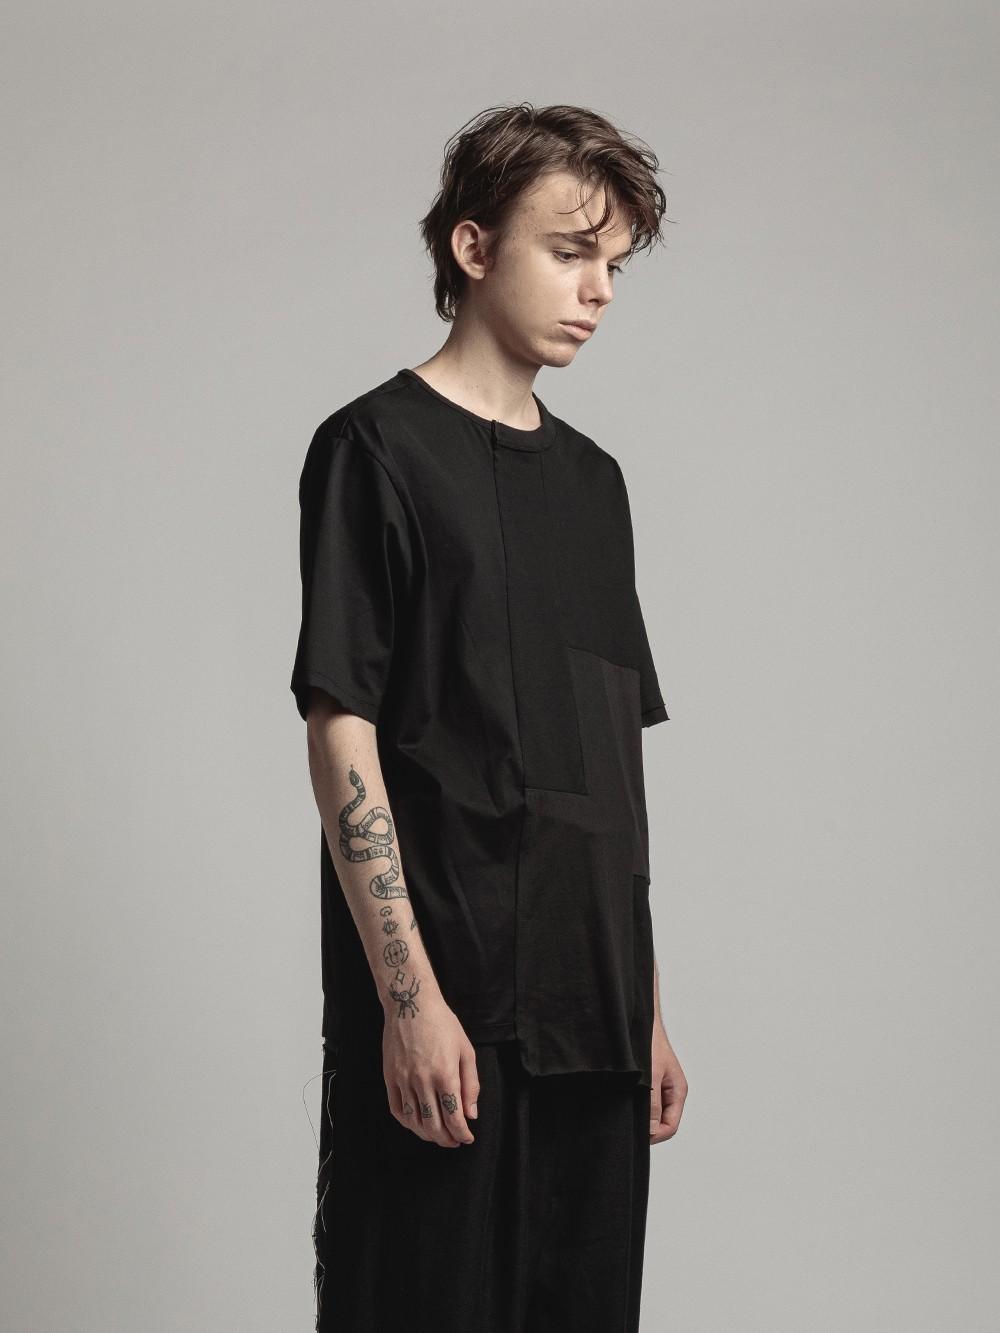 paneled t-shirts